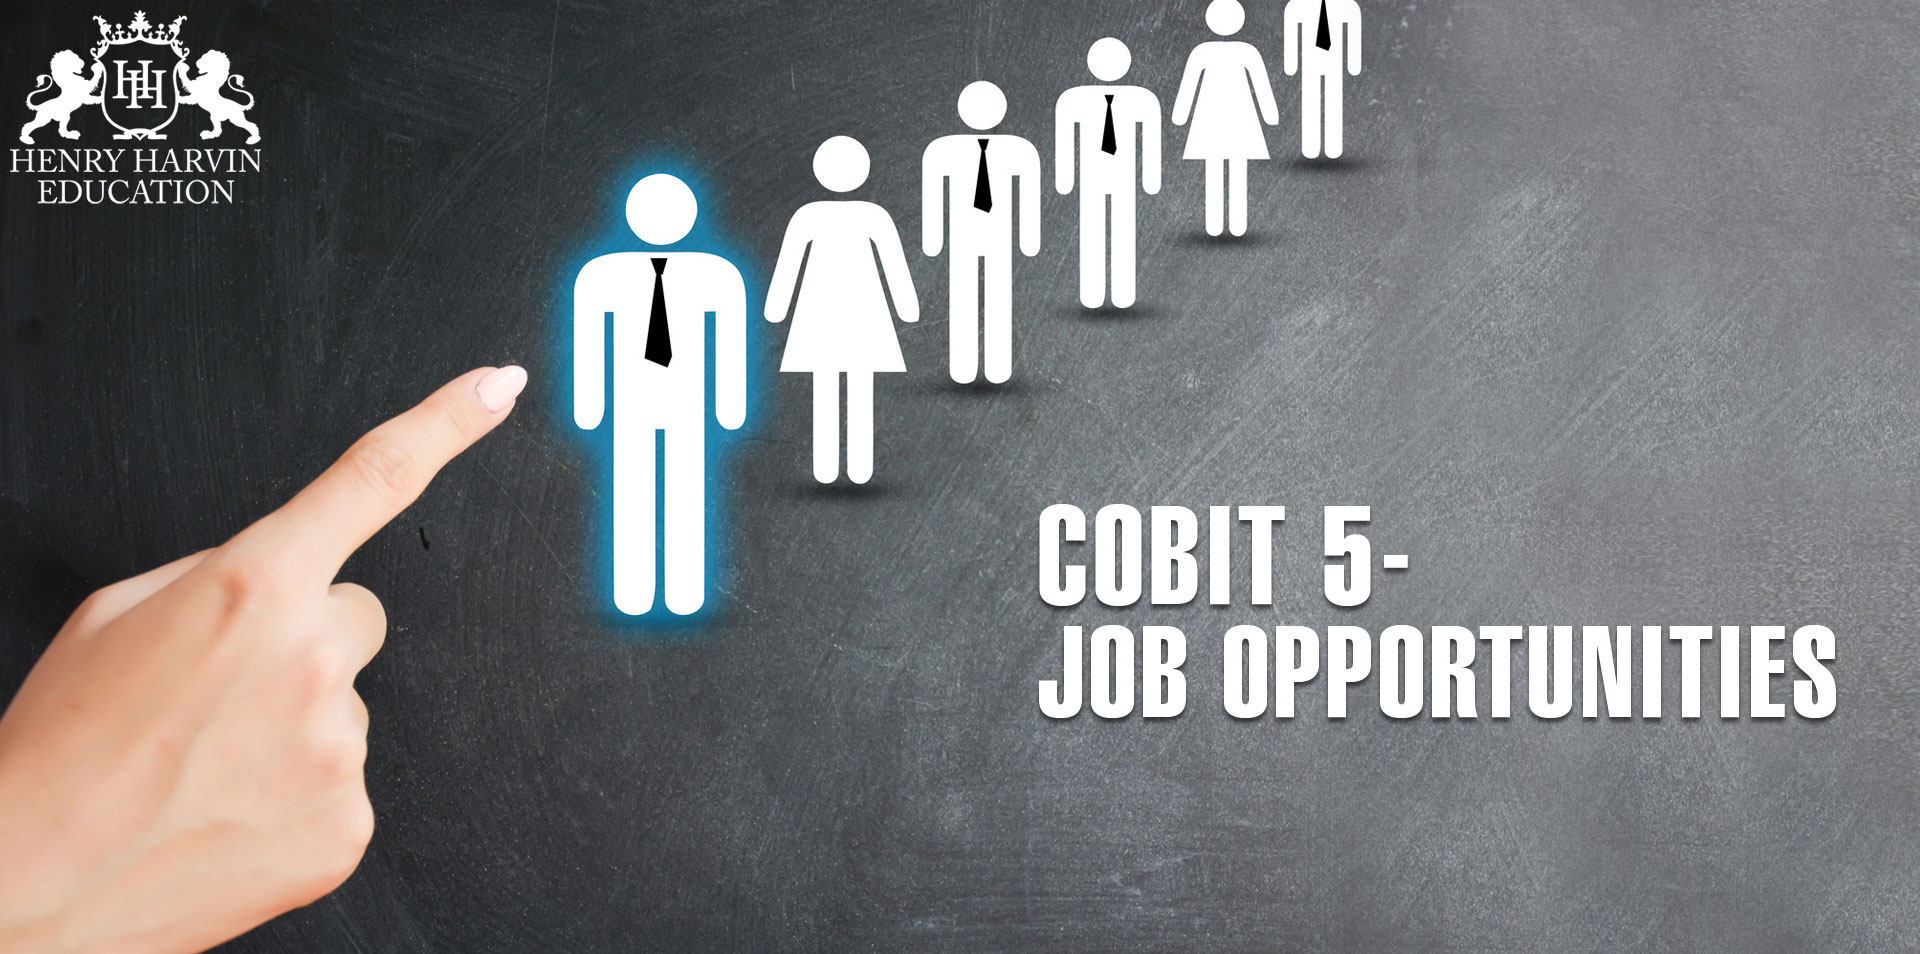 IT Professionals and Job Opportunities | COBIT 5-JOB OPPORTUNITIES